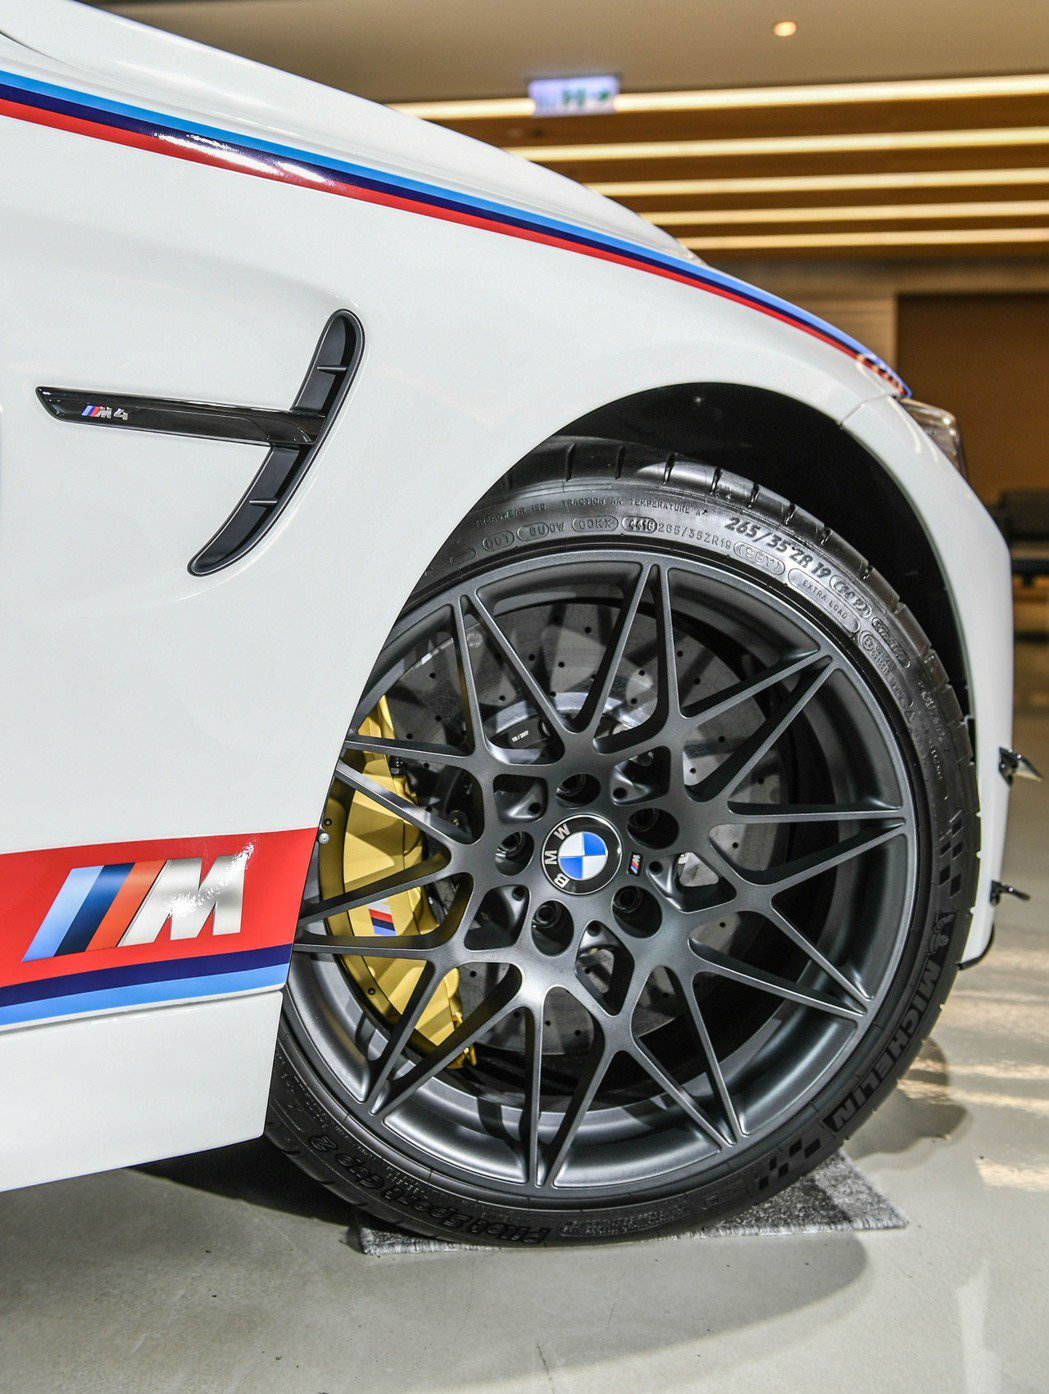 BMW M4 DTM Champion Edition專屬Orbitgrey Matt塗裝前輪19吋及後輪20吋M款星輻式666M型鍛造輪圈。 圖/汎德提供